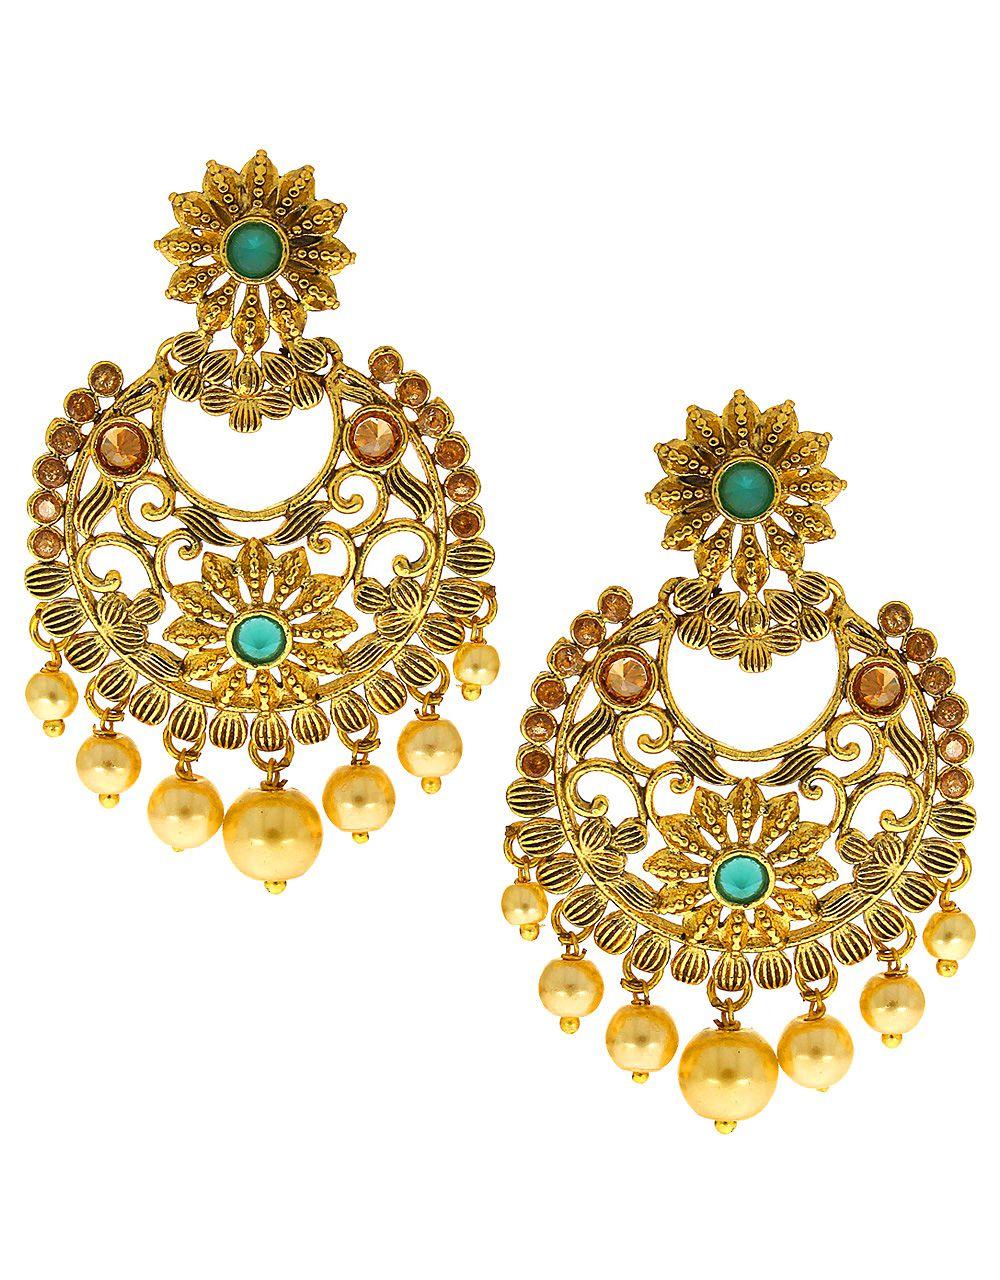 Anuradha Art Golden-Green Tone Chandballi Styled Studded Shimmering Stone Wonderful Traditional Long Earrings For Women/Girls